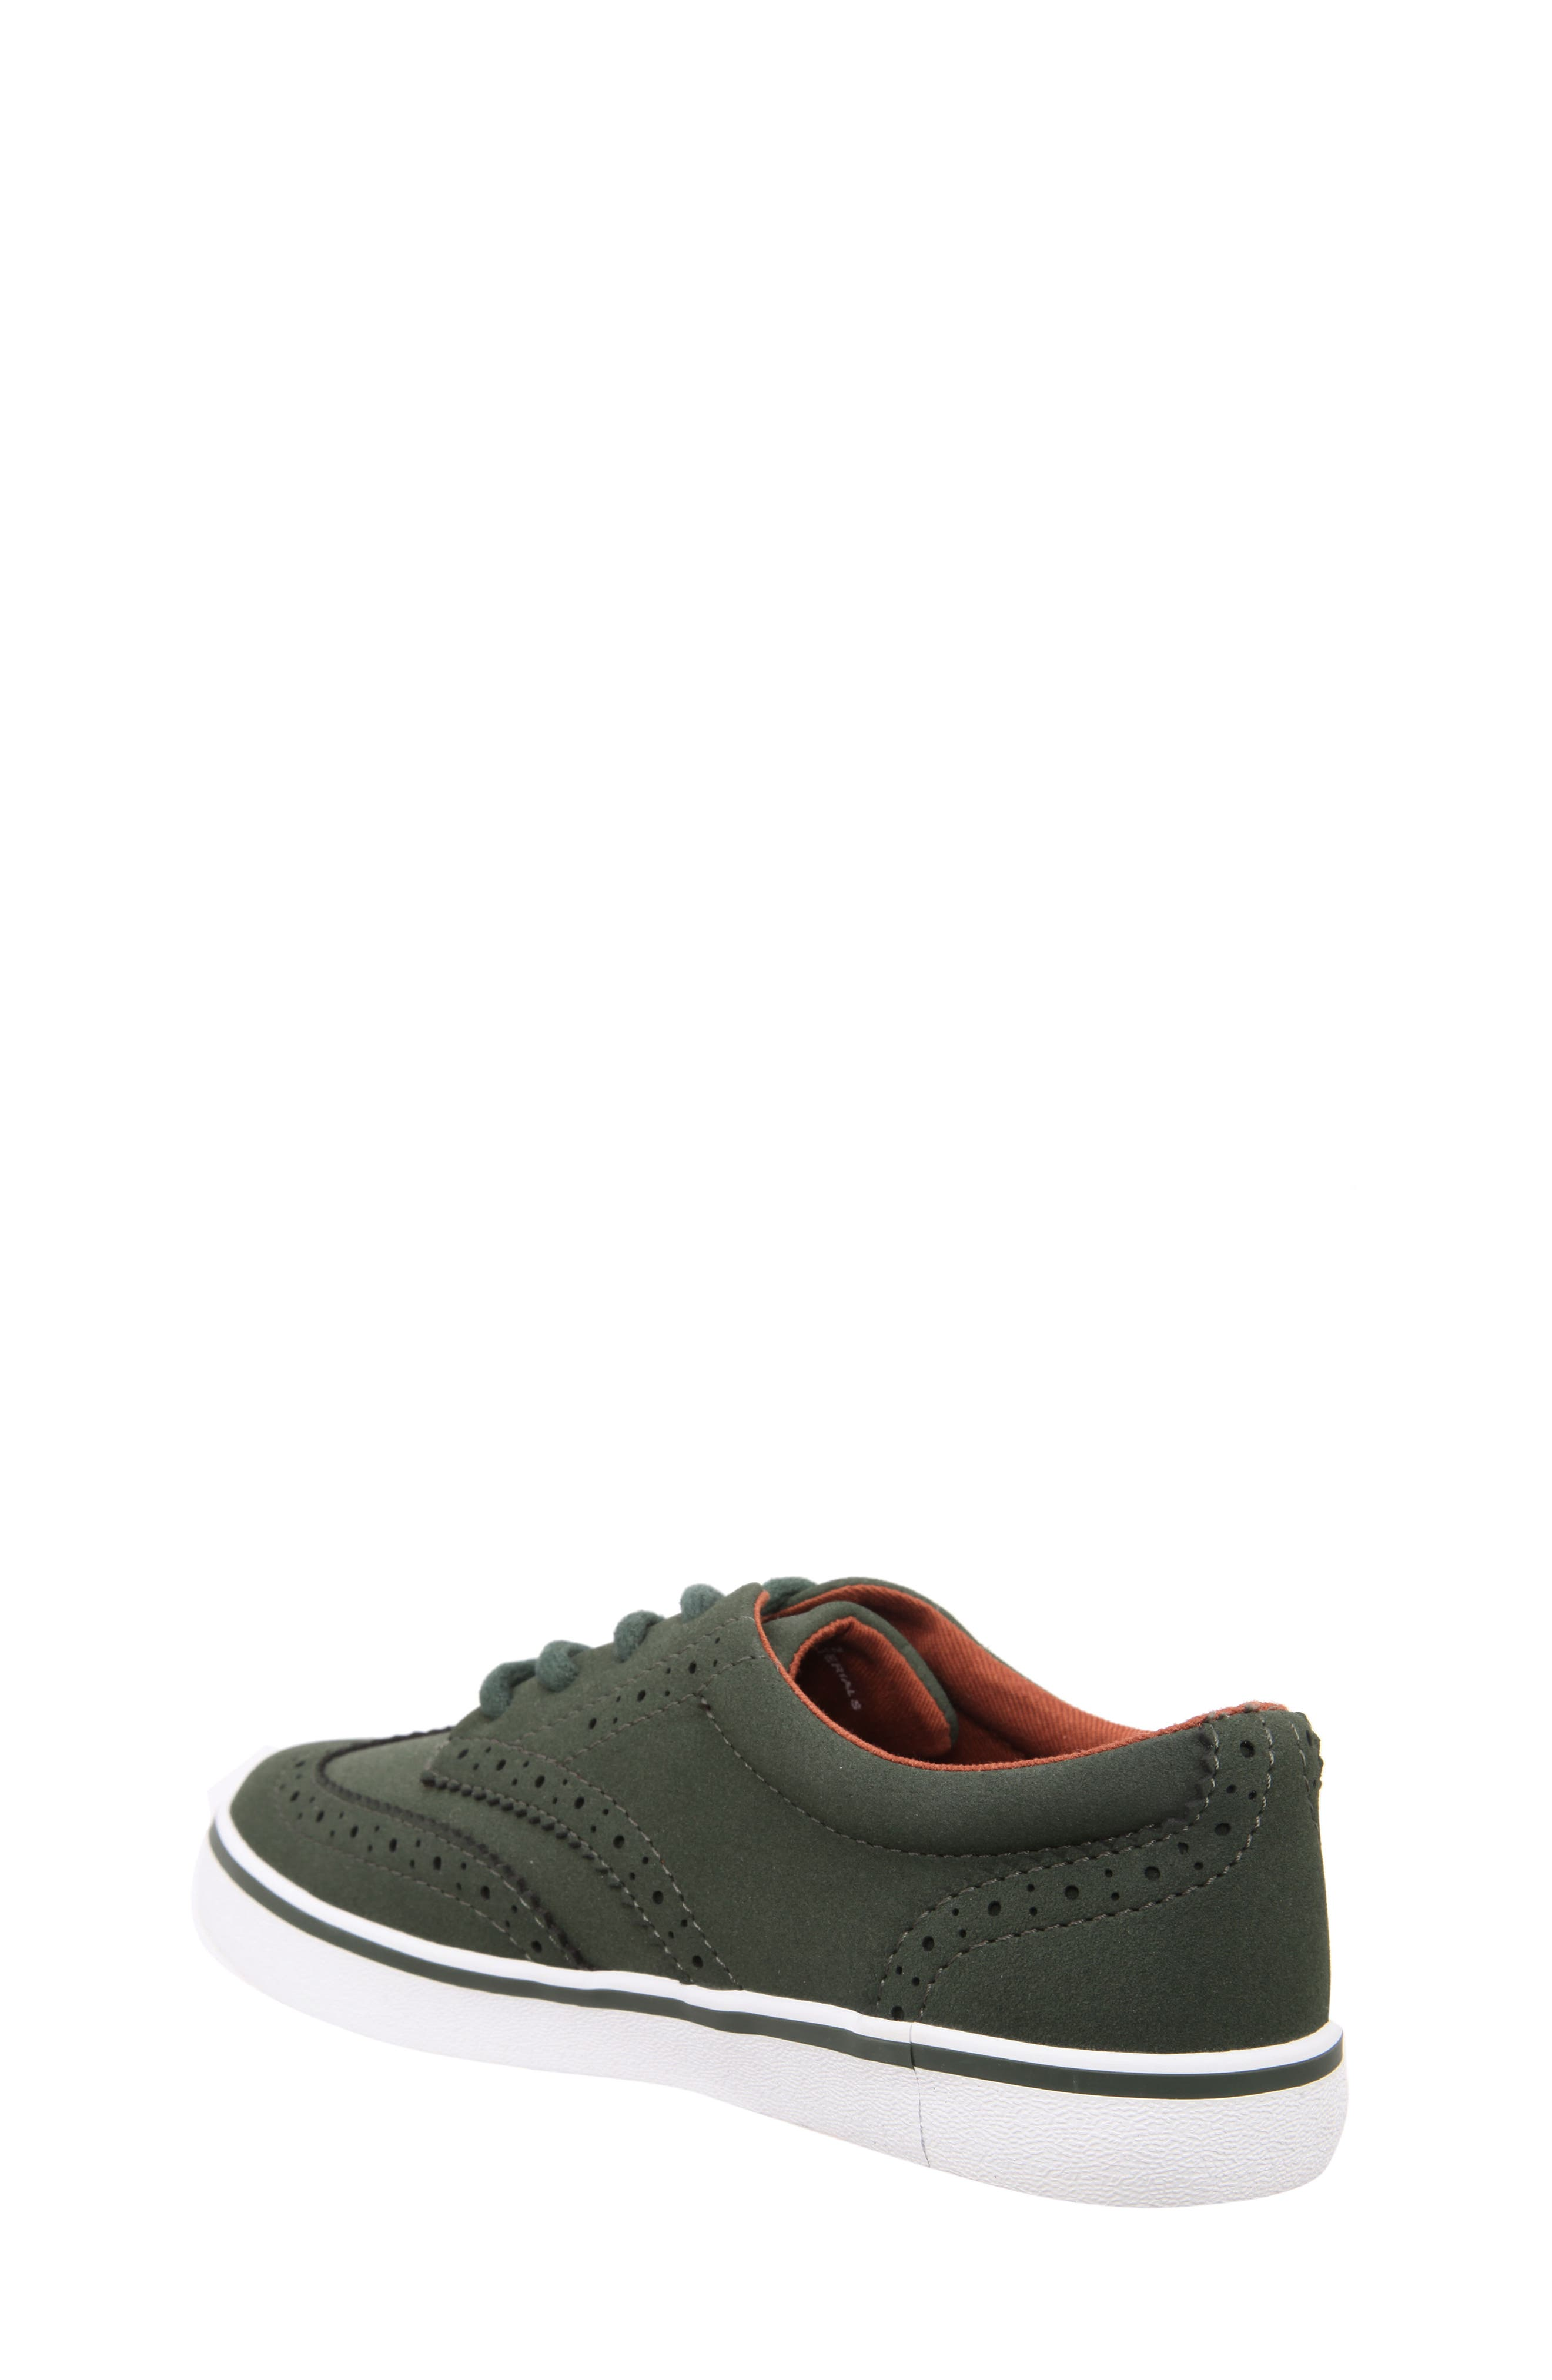 Wingtip Sneaker,                             Alternate thumbnail 6, color,